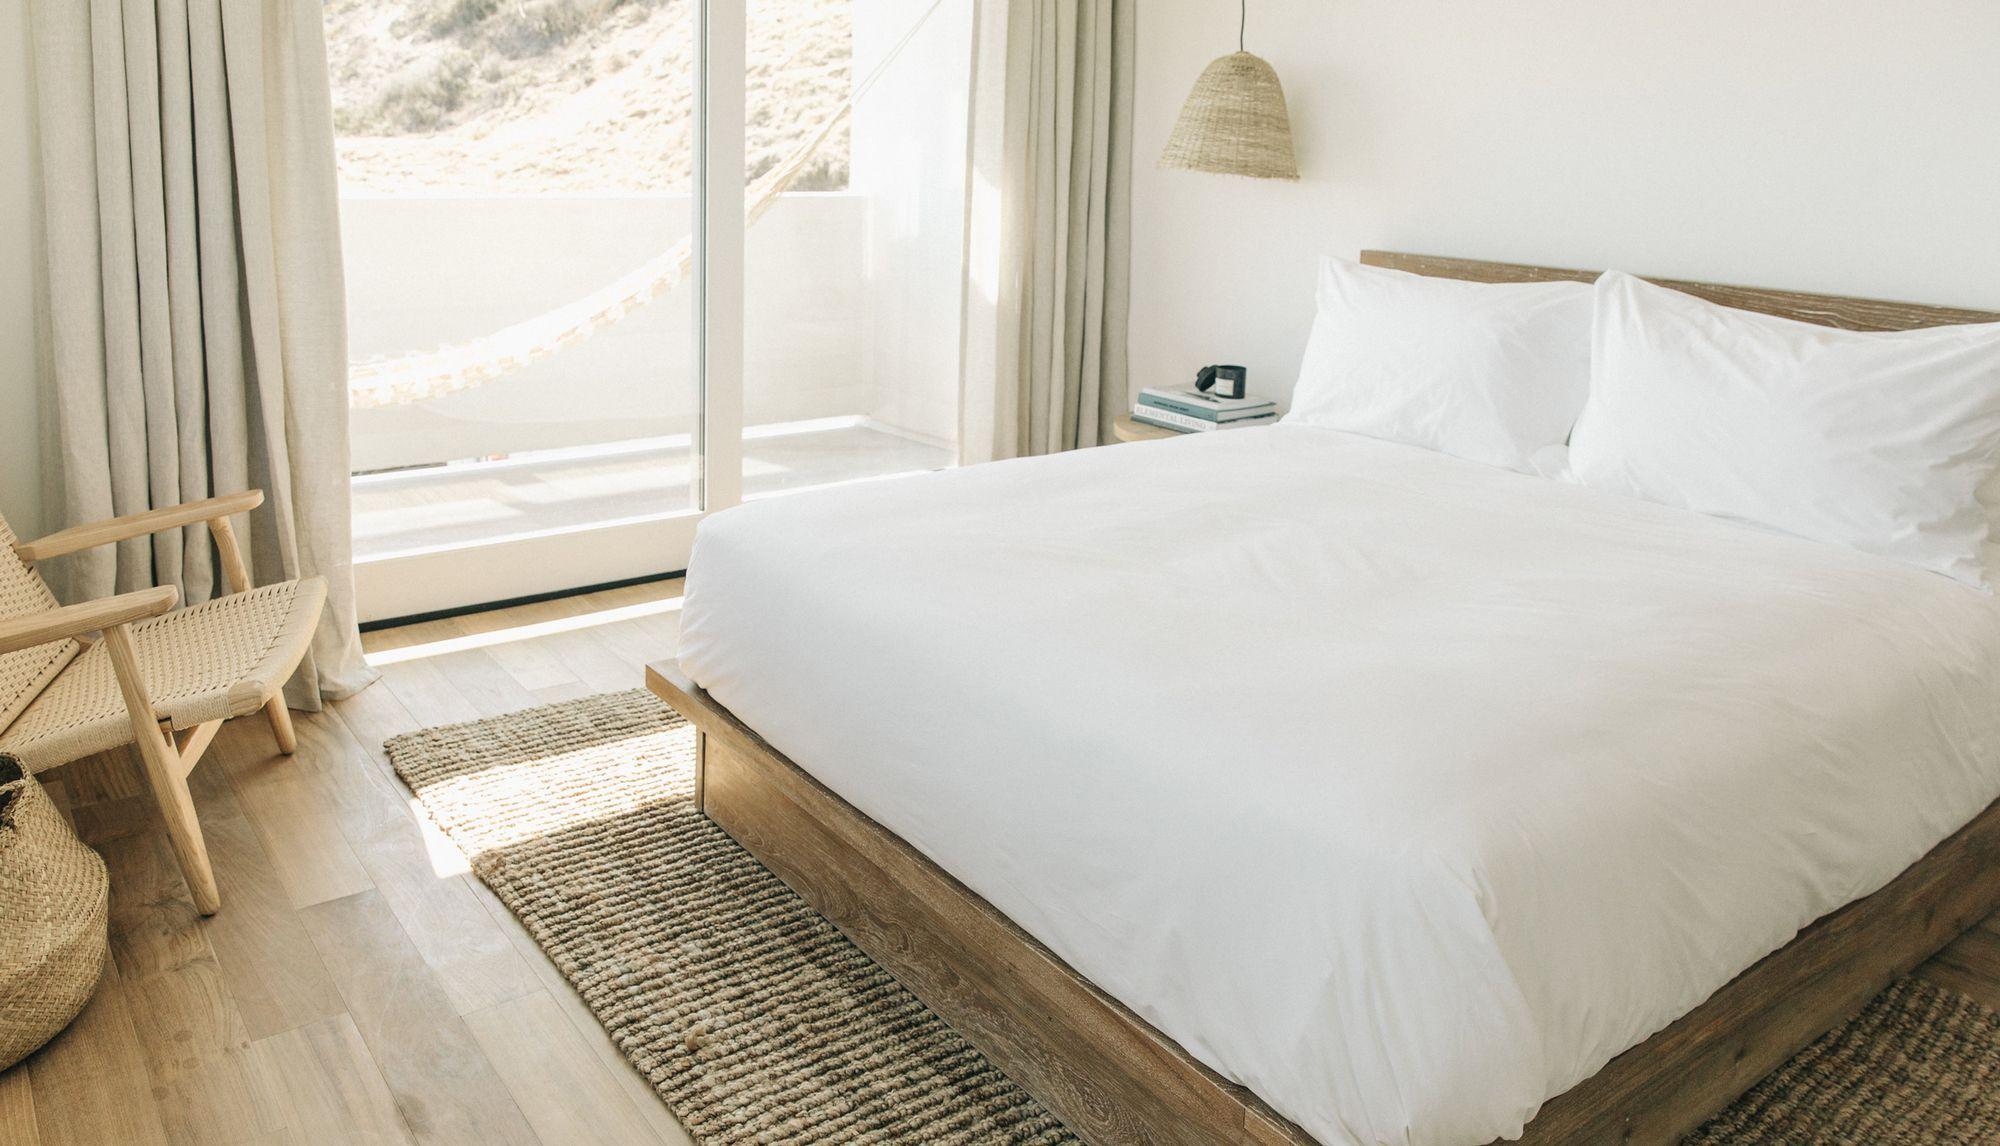 Image Result For The Surfrider Hotel Malibu